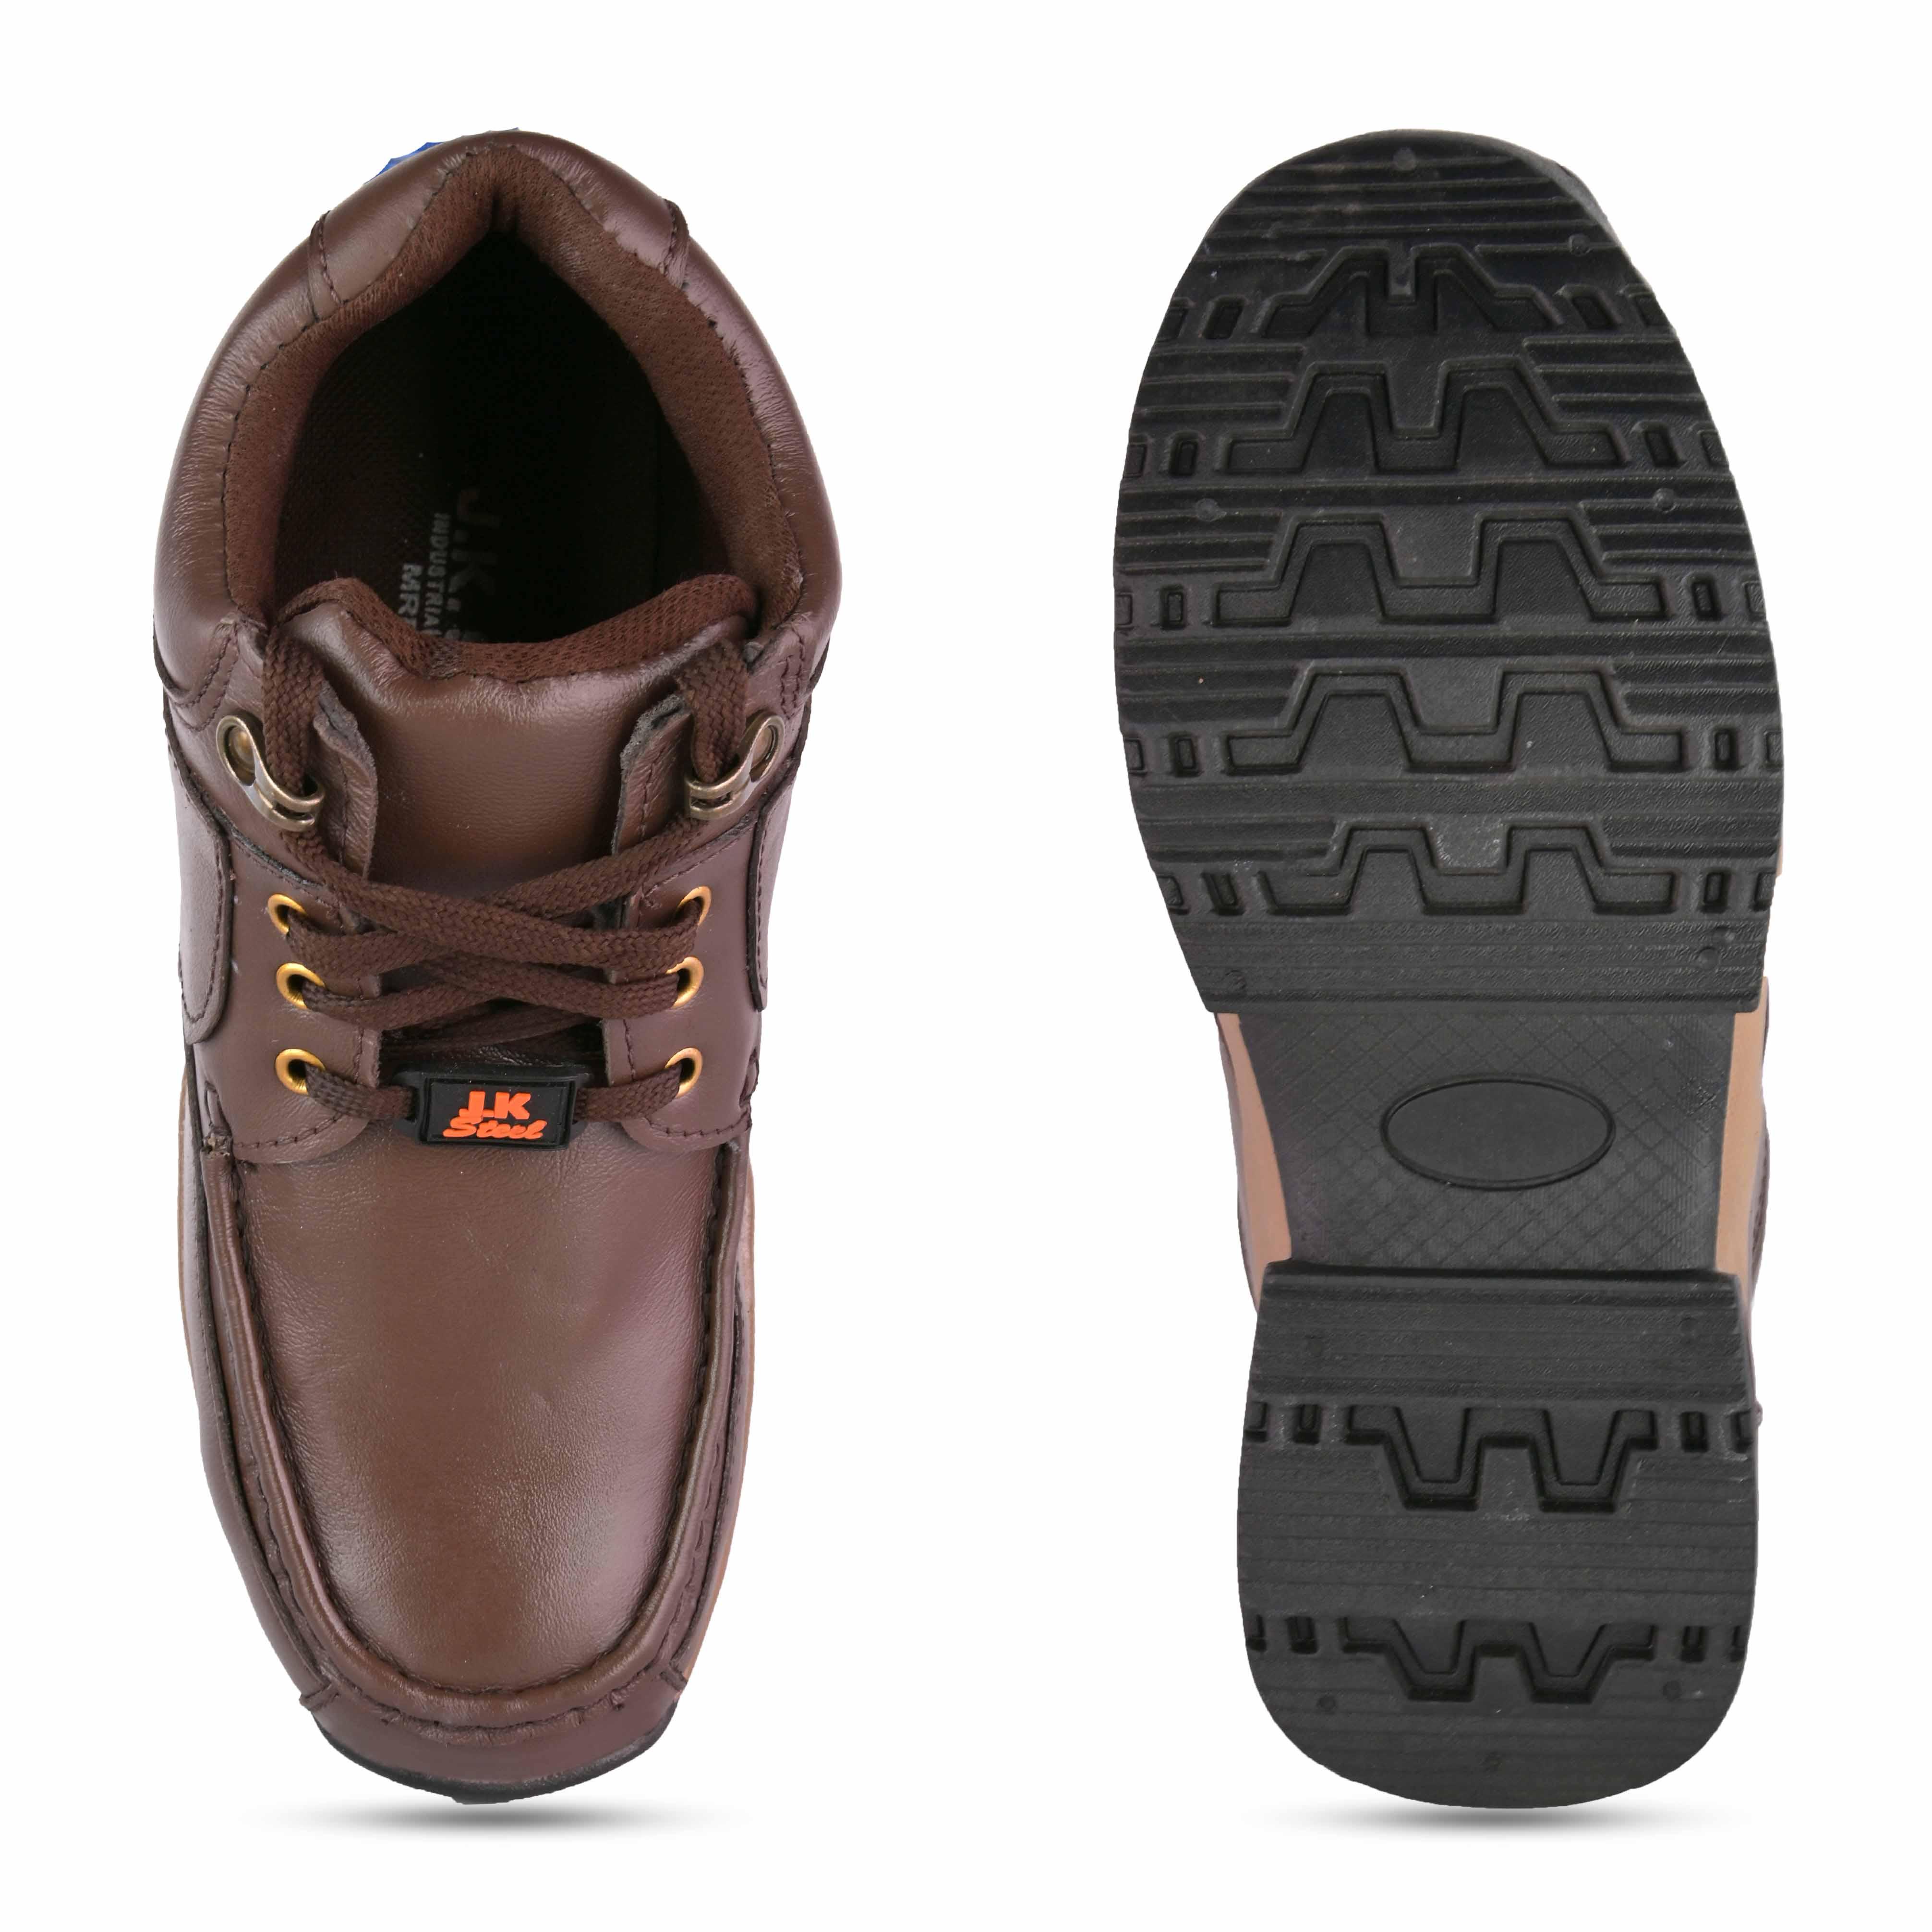 JK STEEL Original Safety Shoes Presents Genuine Leather Stylish Brown Safety JKPSF143BRN (Brown, 6-10, 8 PAIR)